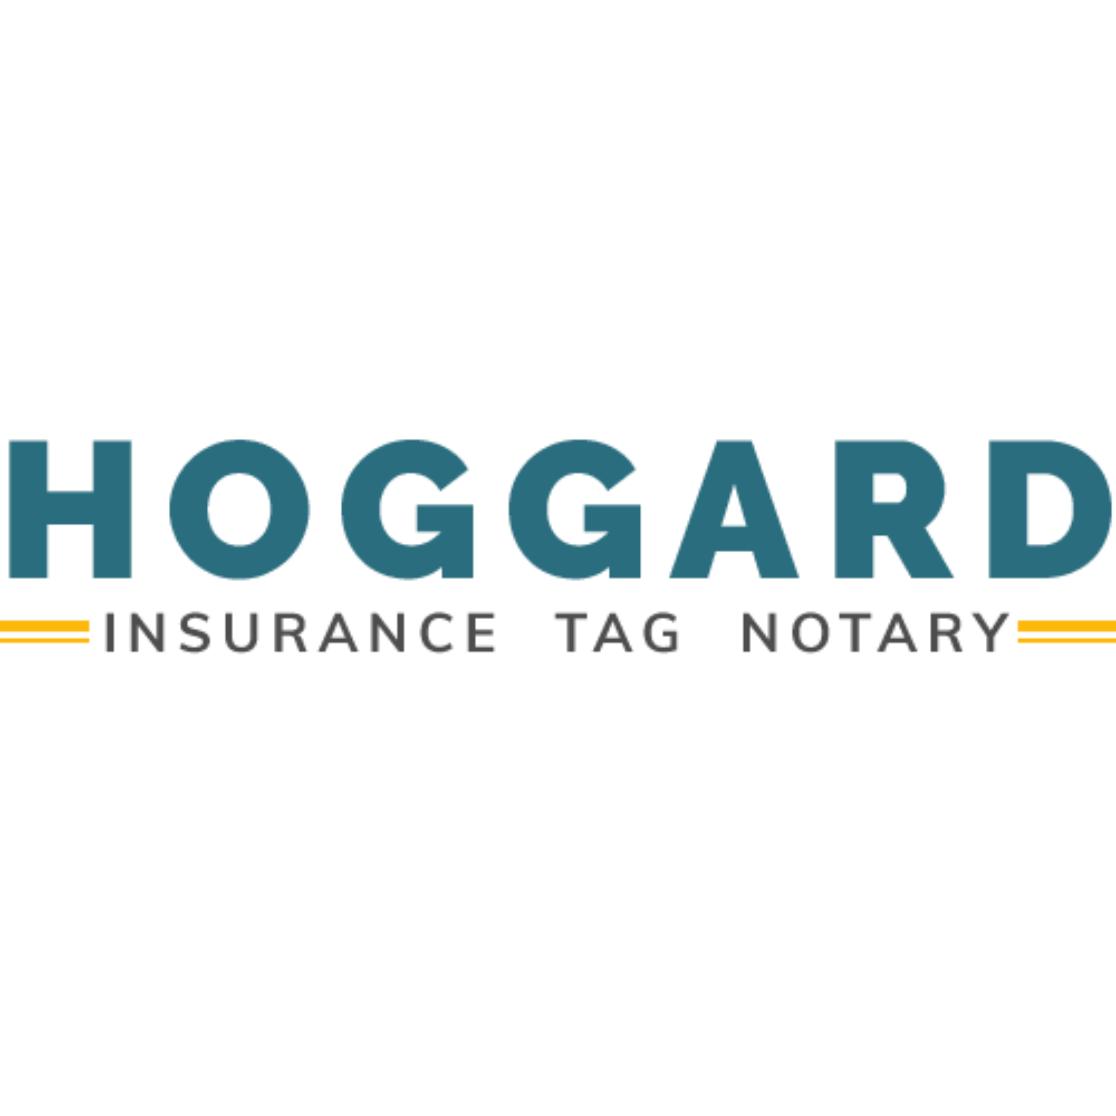 Hoggard Insurance Tag Notary Agency